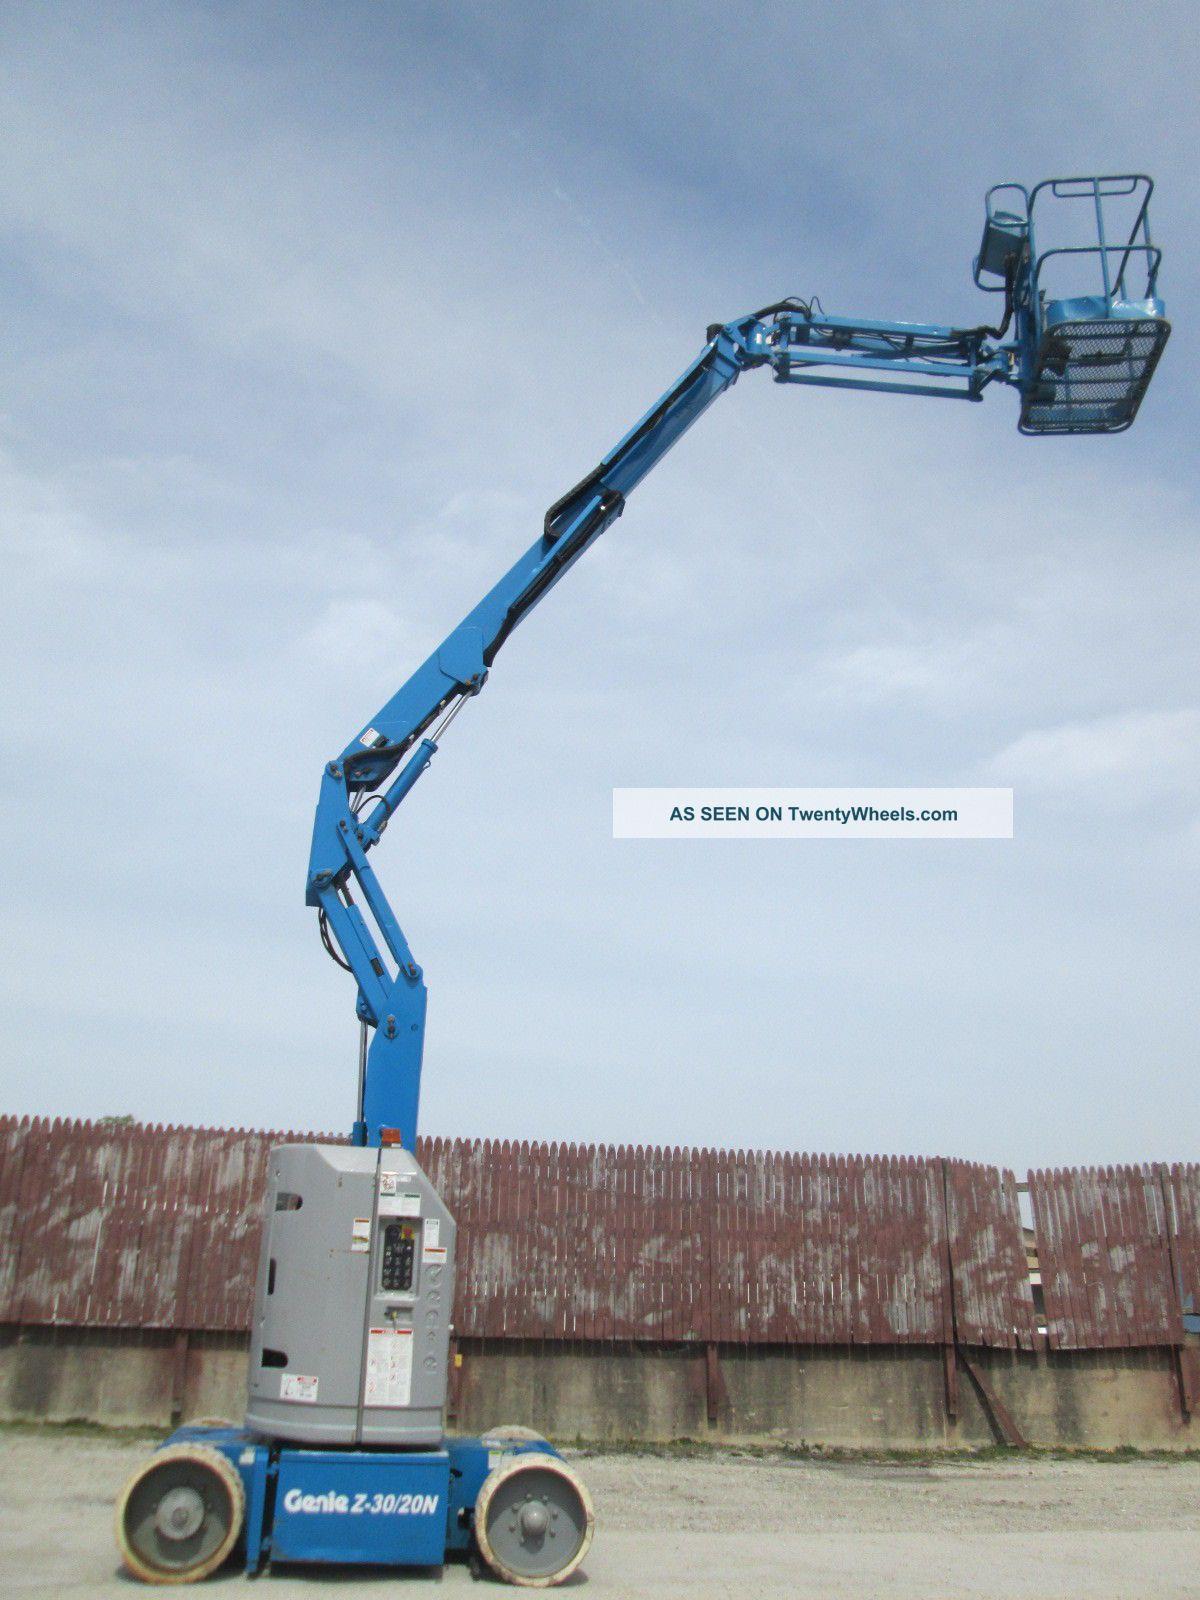 Genie Z3020n Rj Articulating Aerial Lift Boom Lift Genie Platform Lift